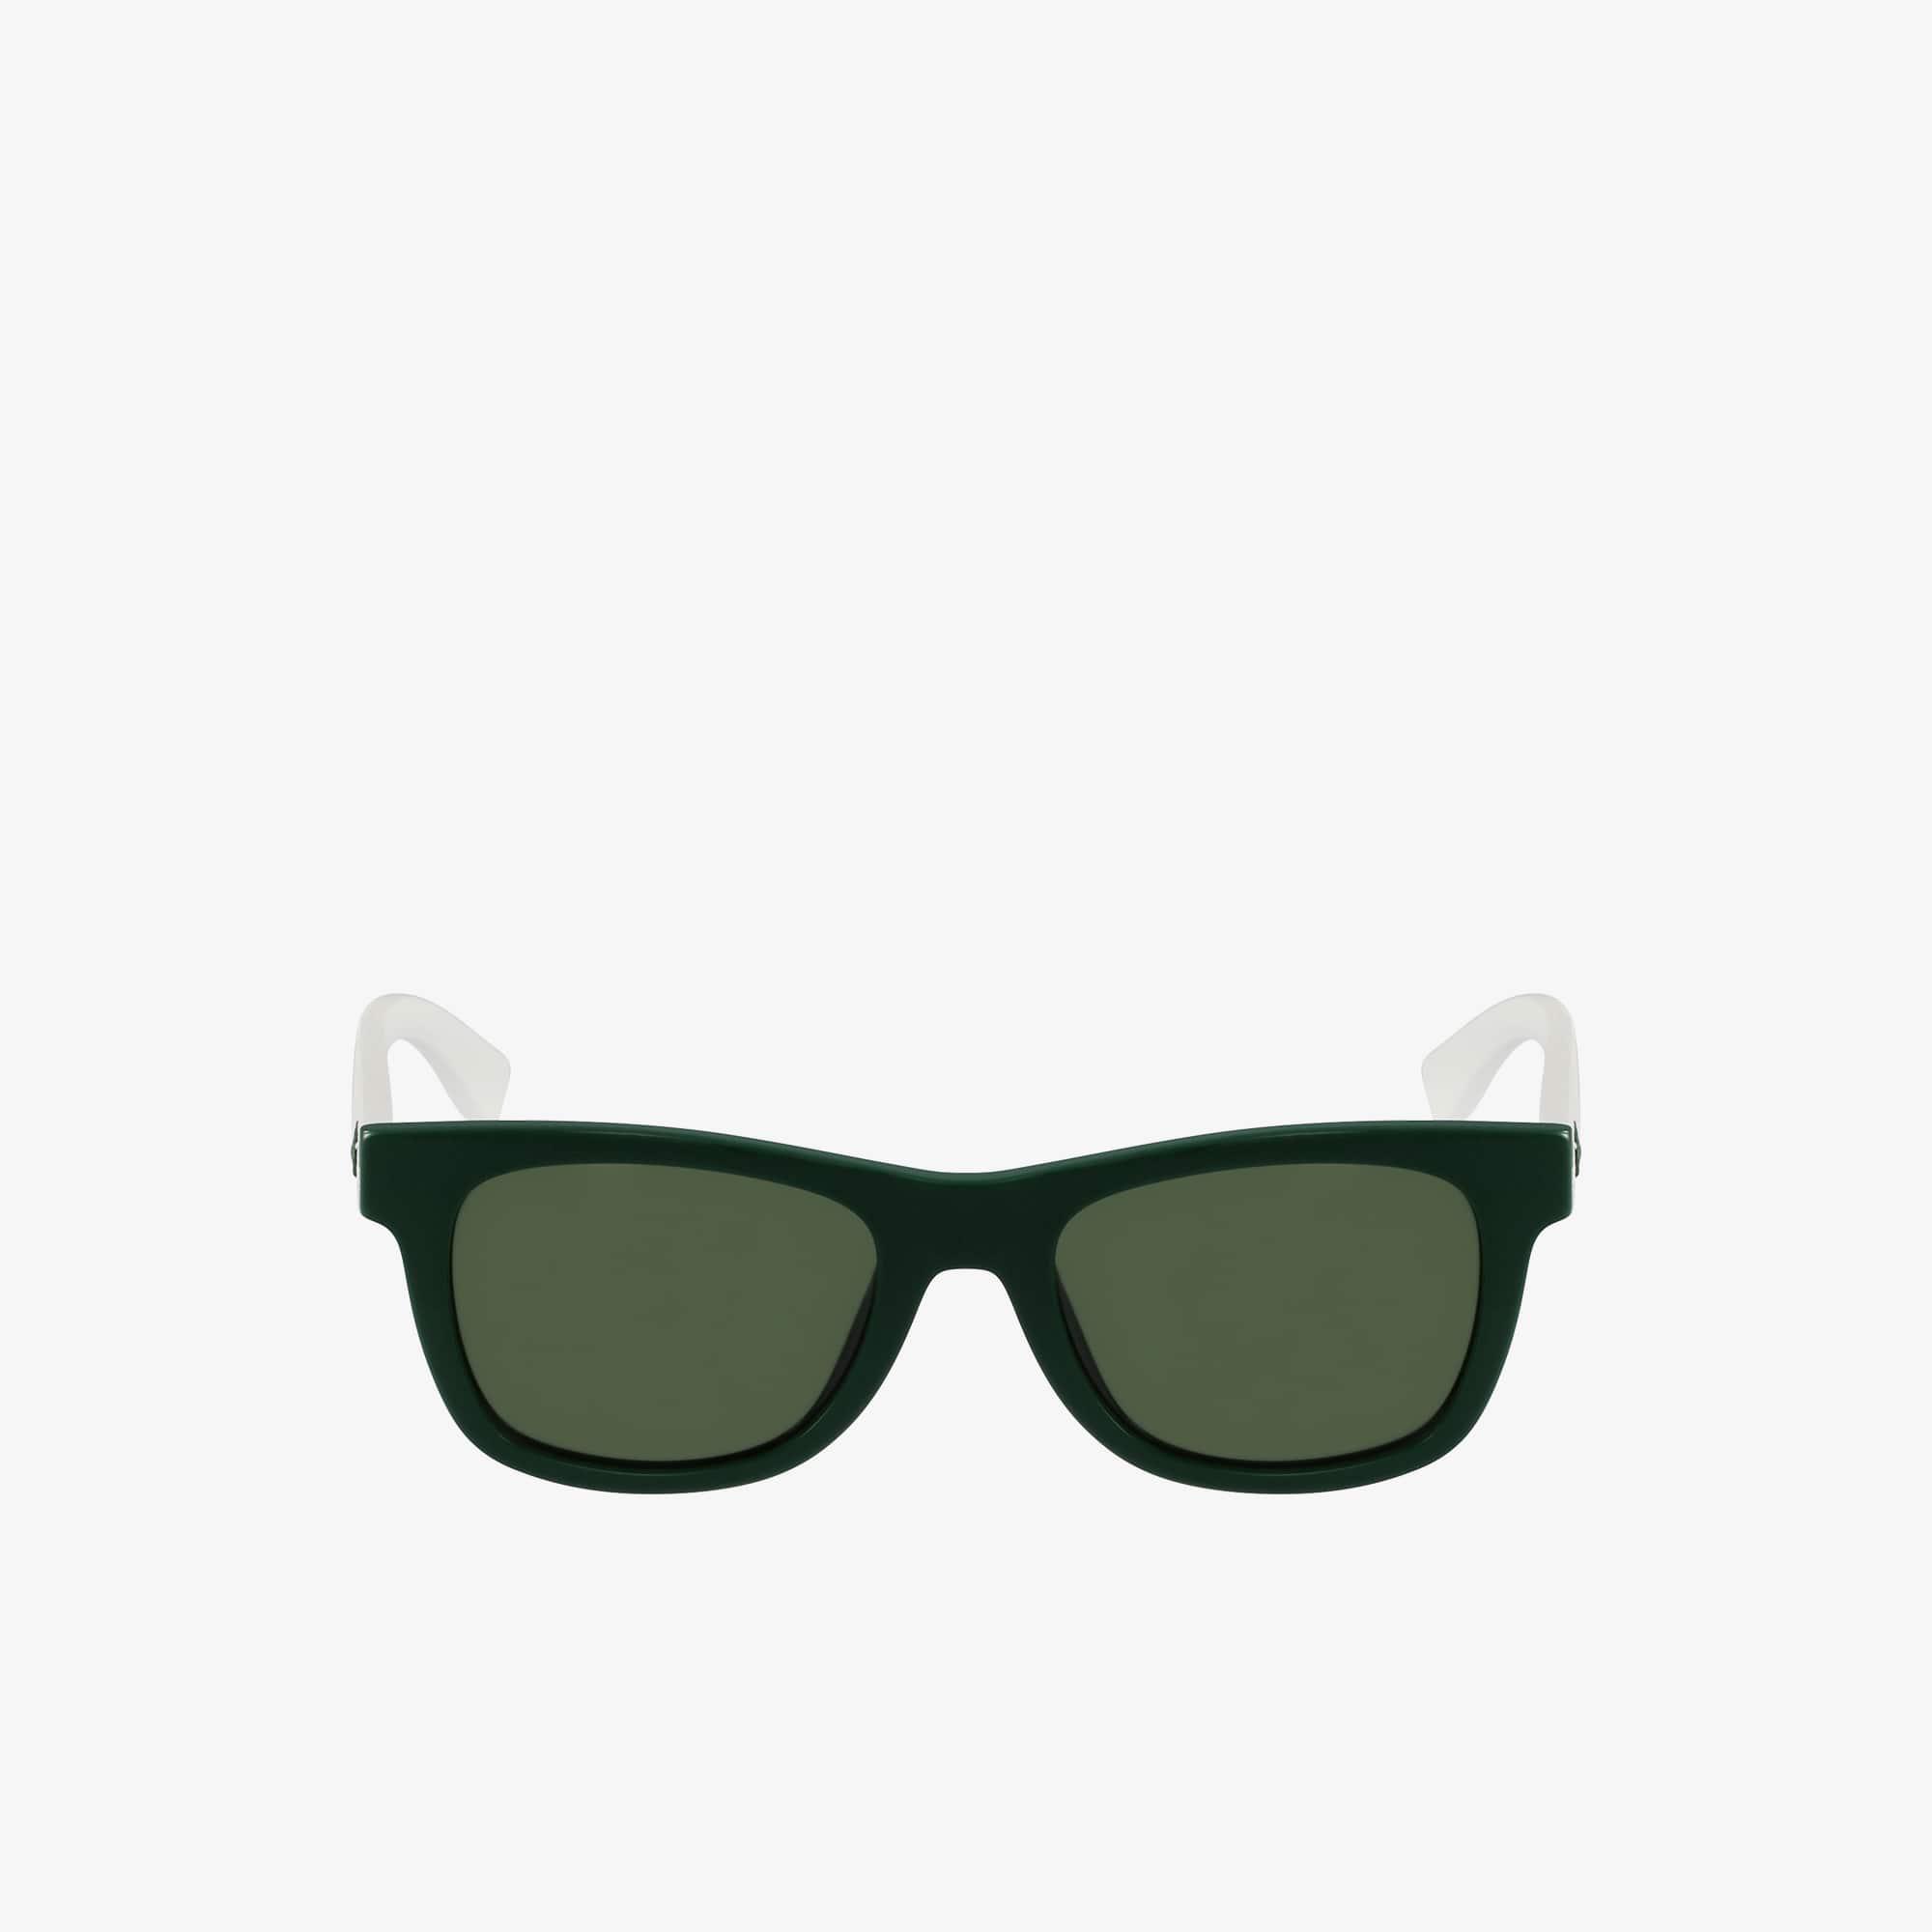 L. 12.12 T(W)EENS Sonnenbrille aus Kunststoff